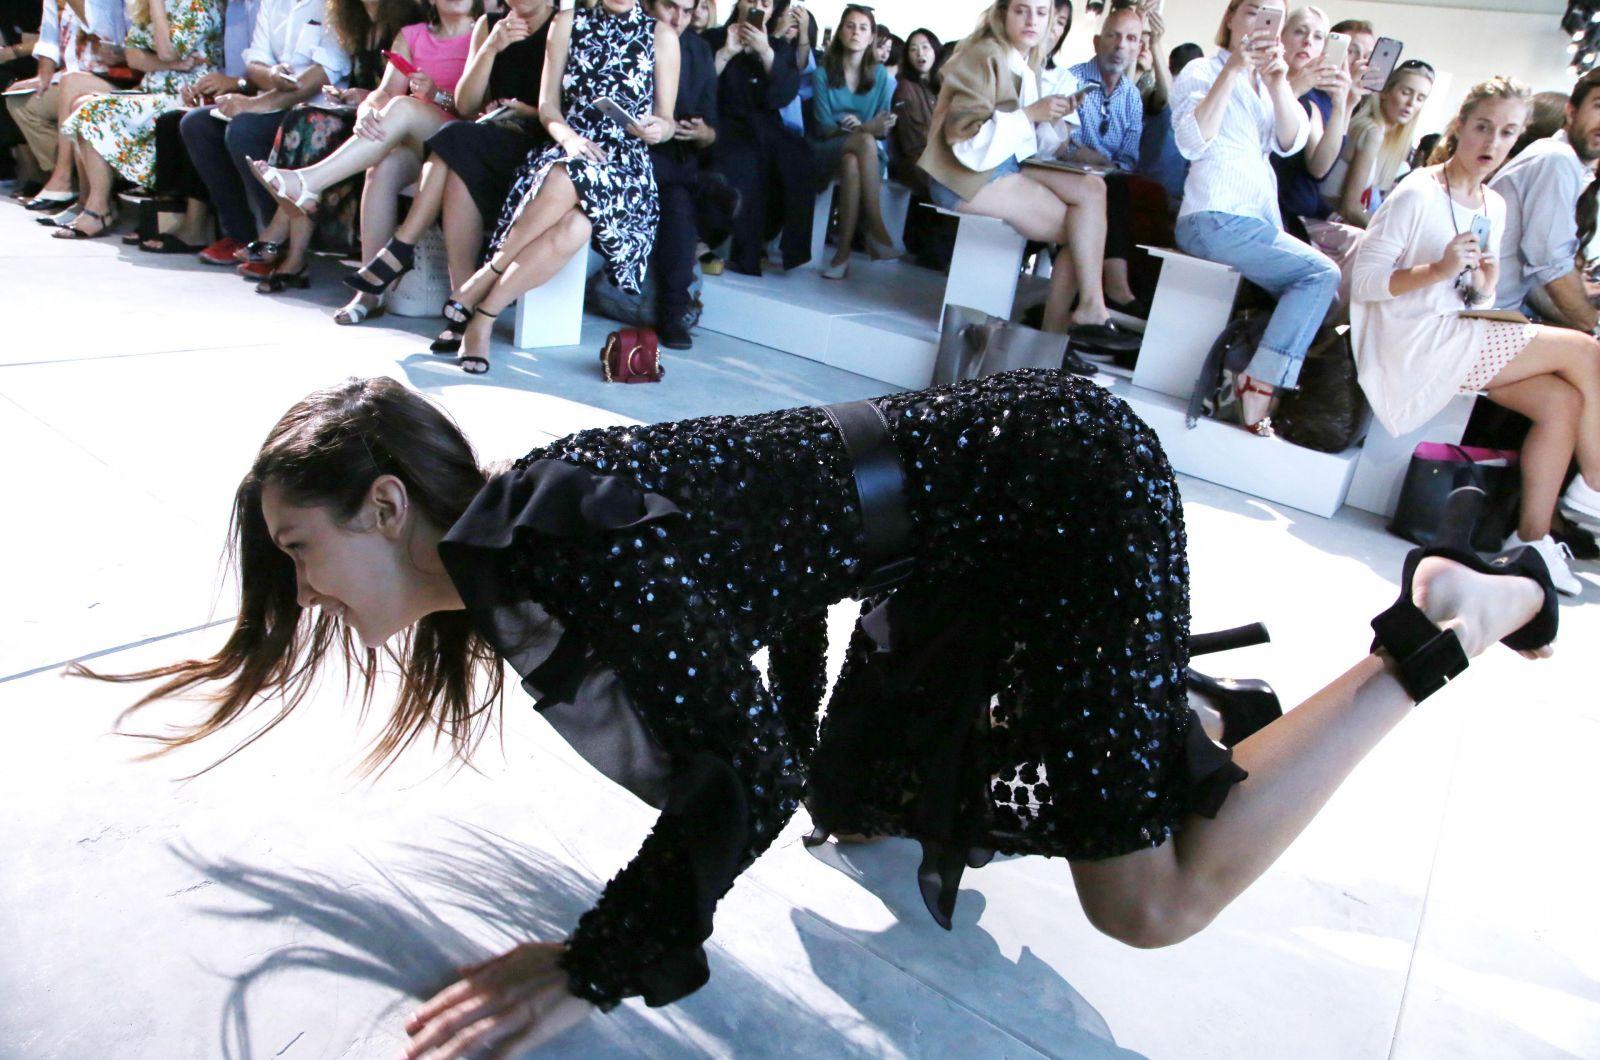 Белла Хадид упала на подиуме во время показа Michael Kors (ФОТО)